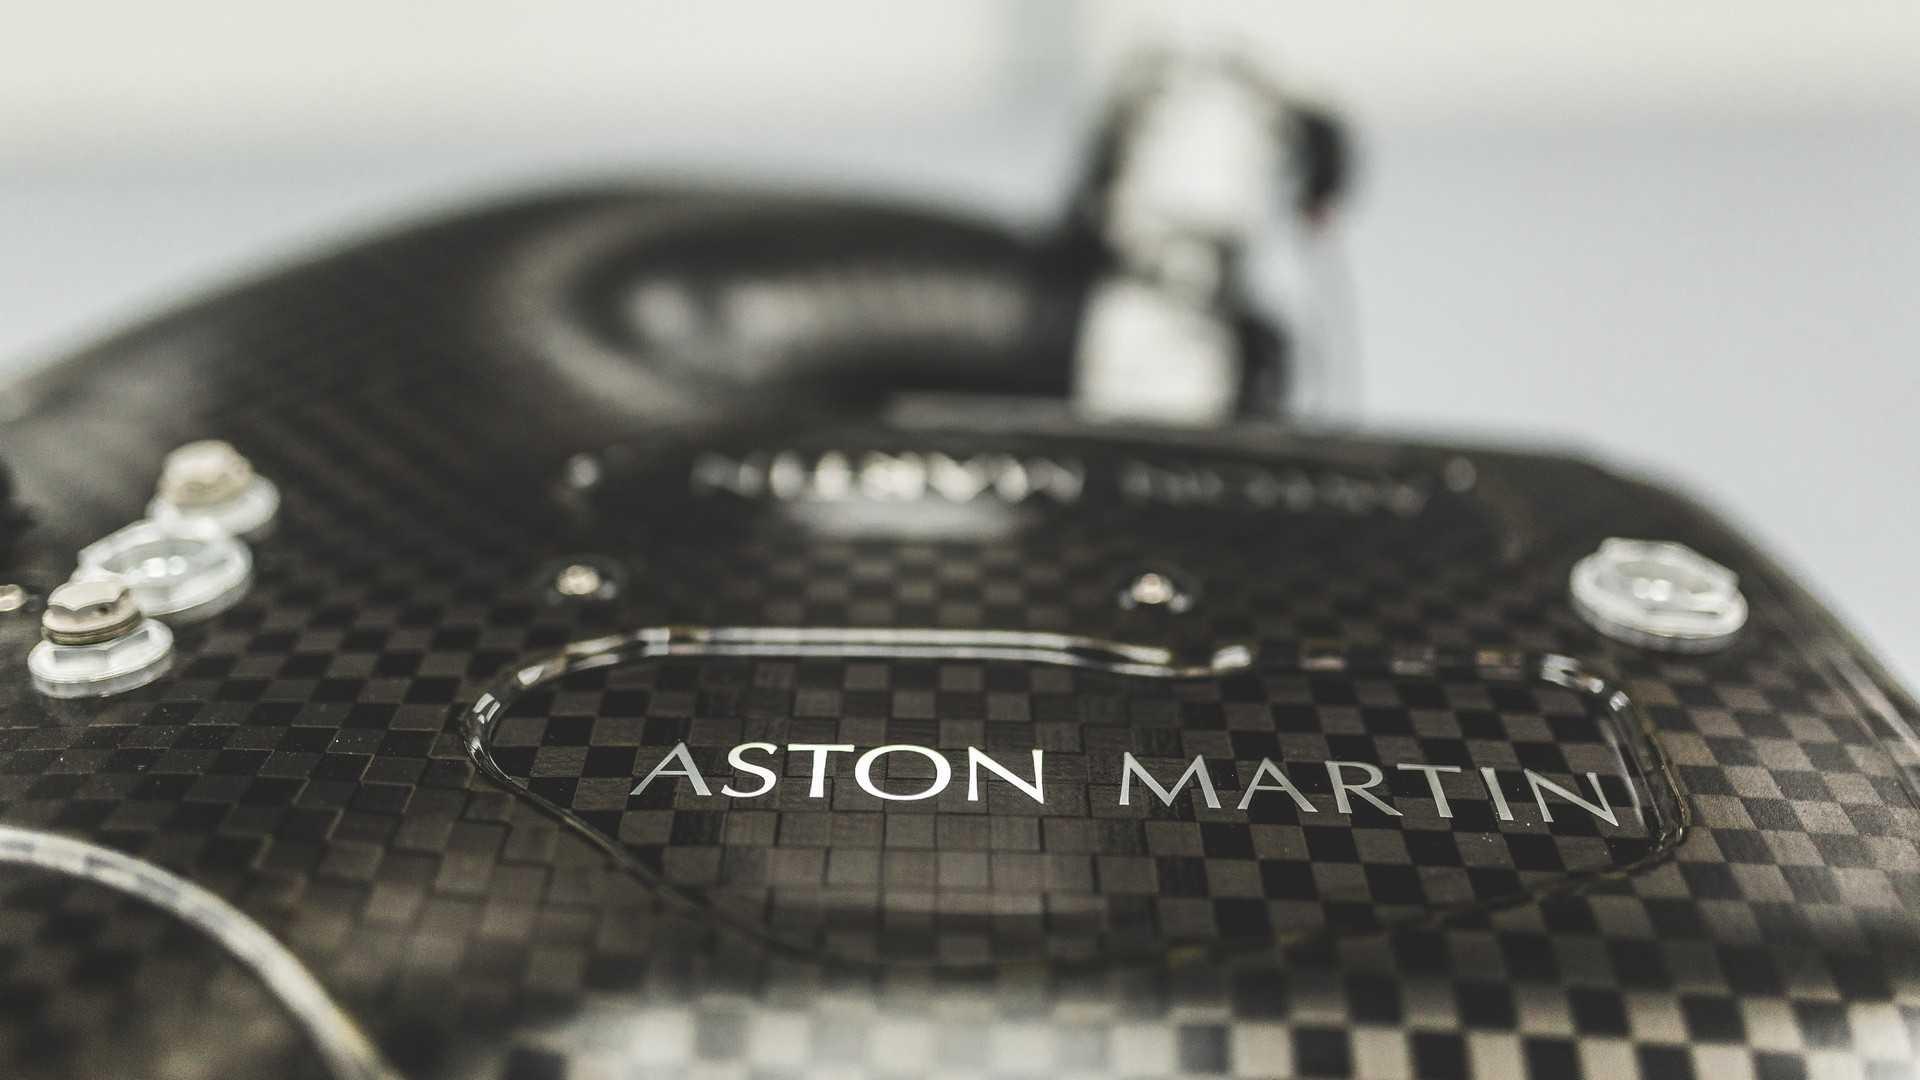 aston-martin-valkyrie-s-cosworth-v12-engine (10)